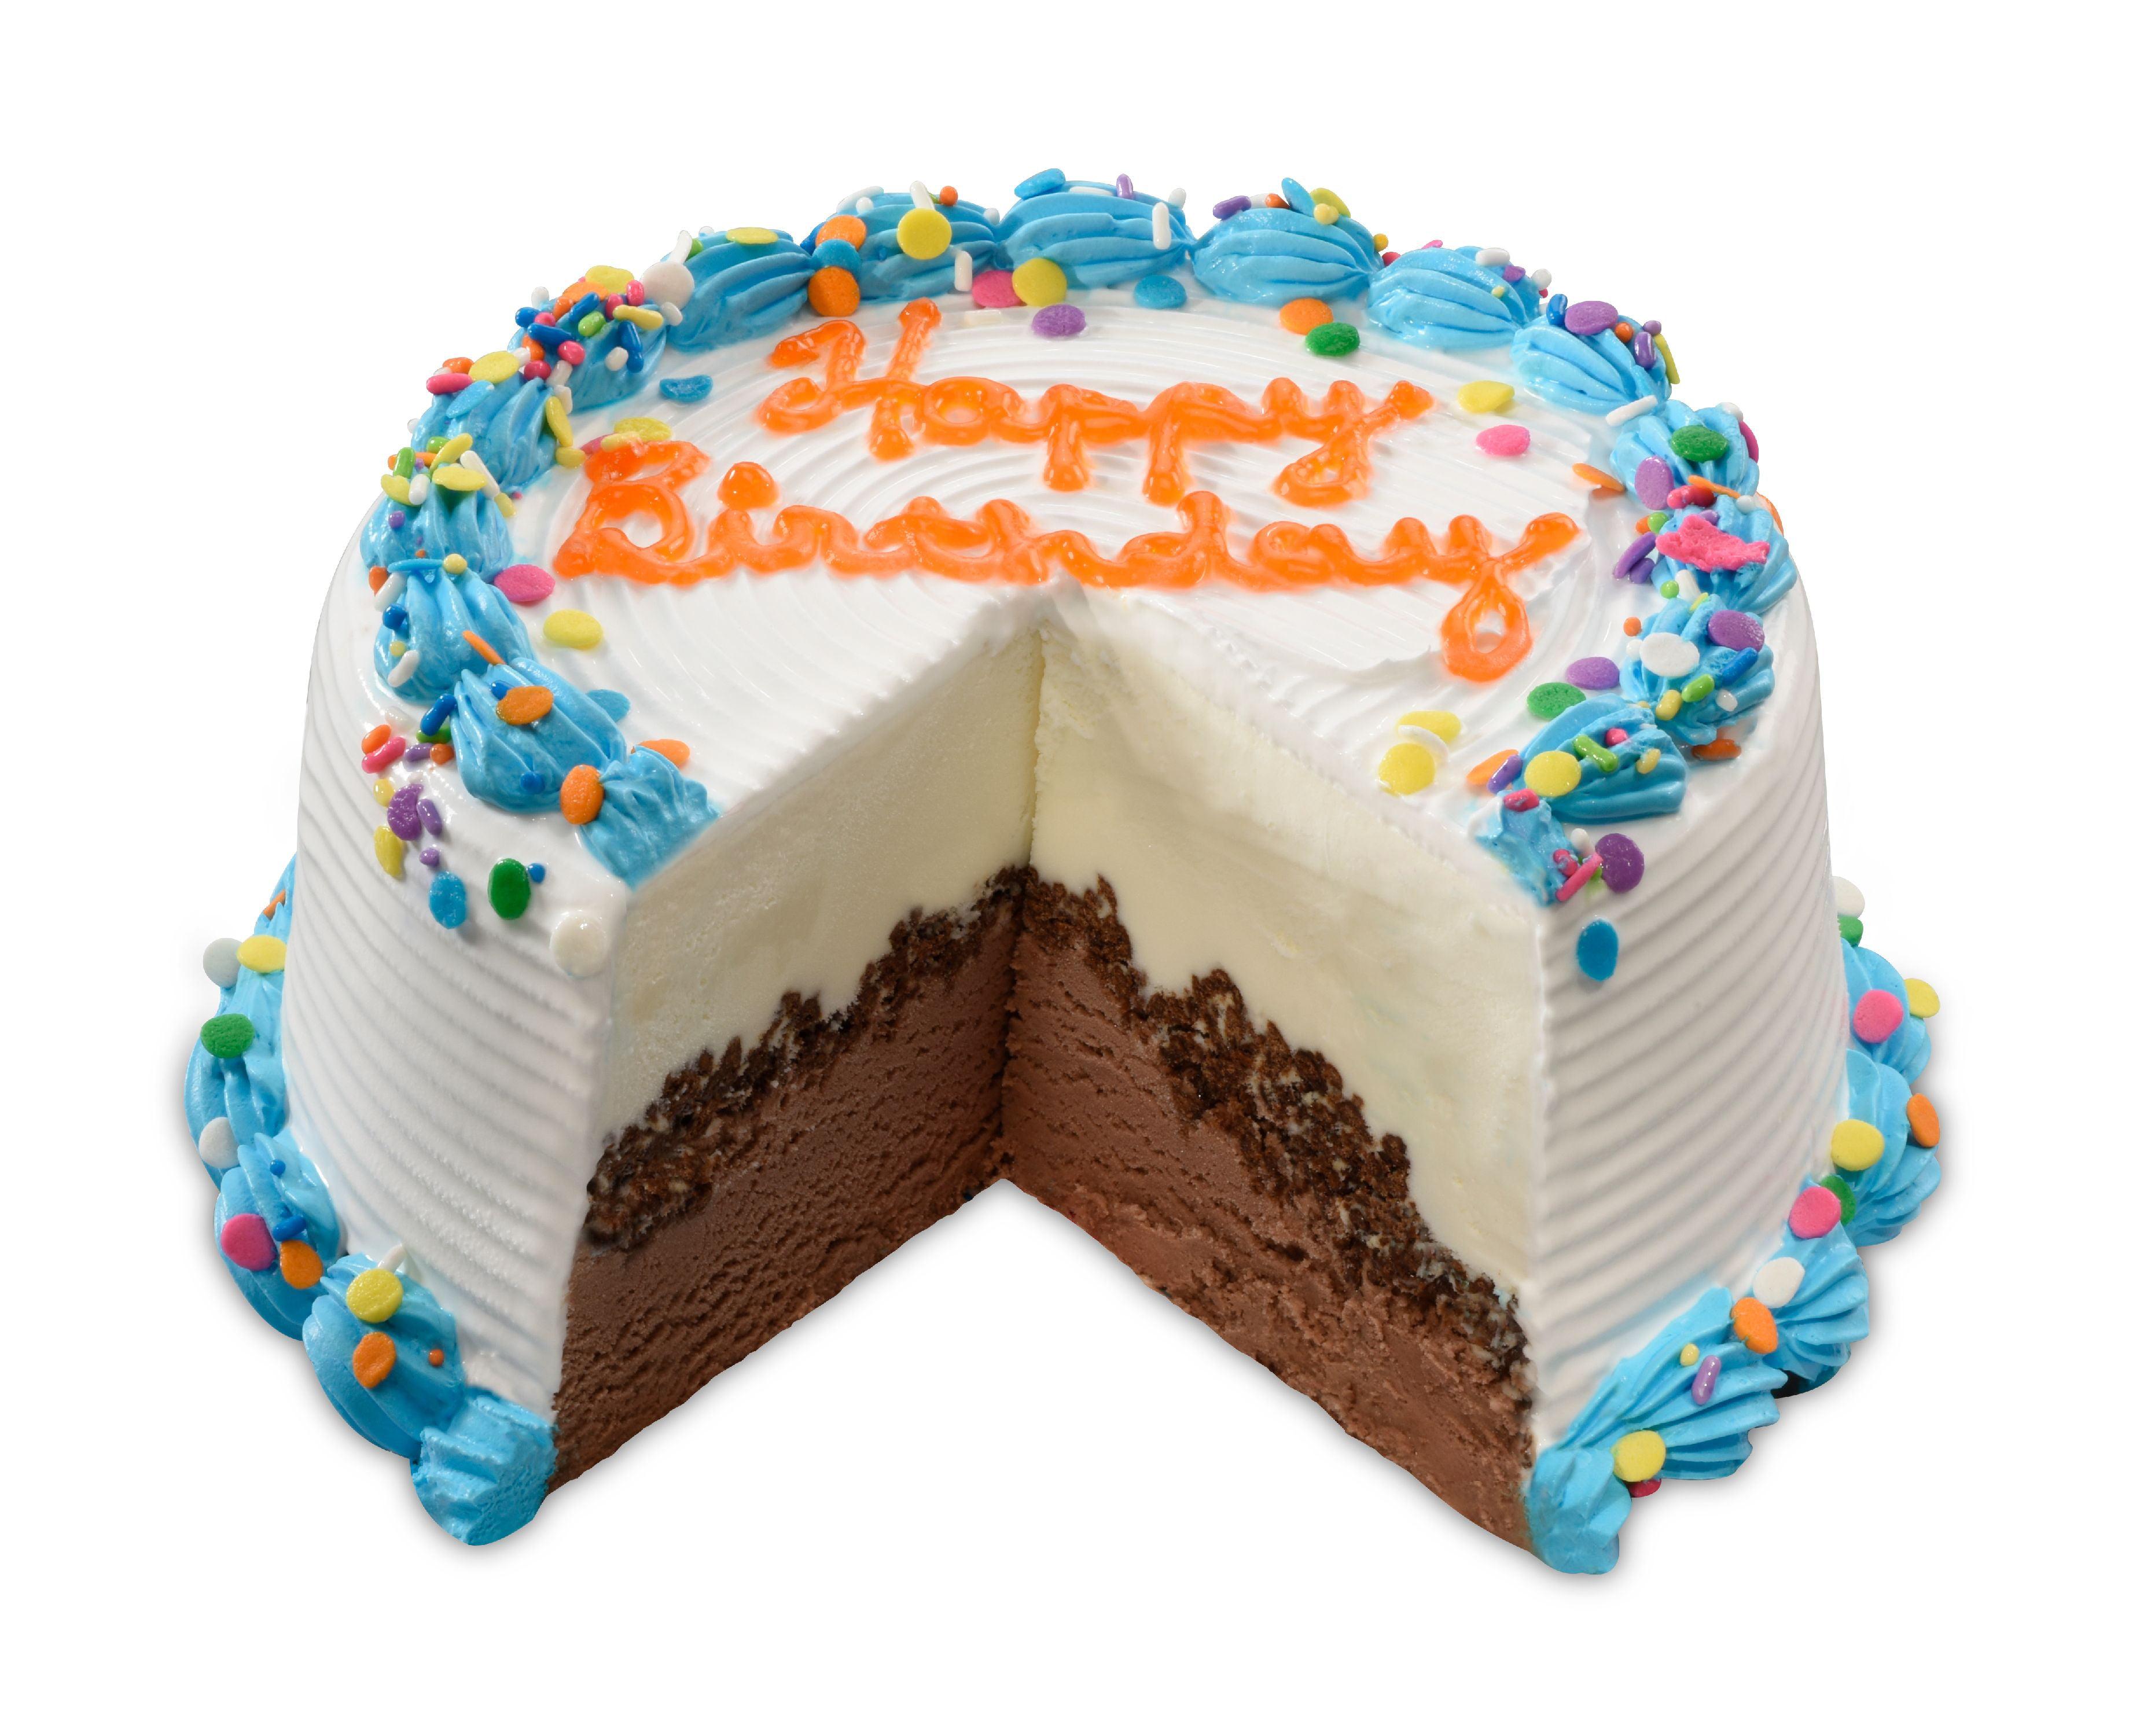 Fabulous Carvel 8 Inch Round Ice Cream Cake Chocolate And Vanilla Ice Funny Birthday Cards Online Elaedamsfinfo